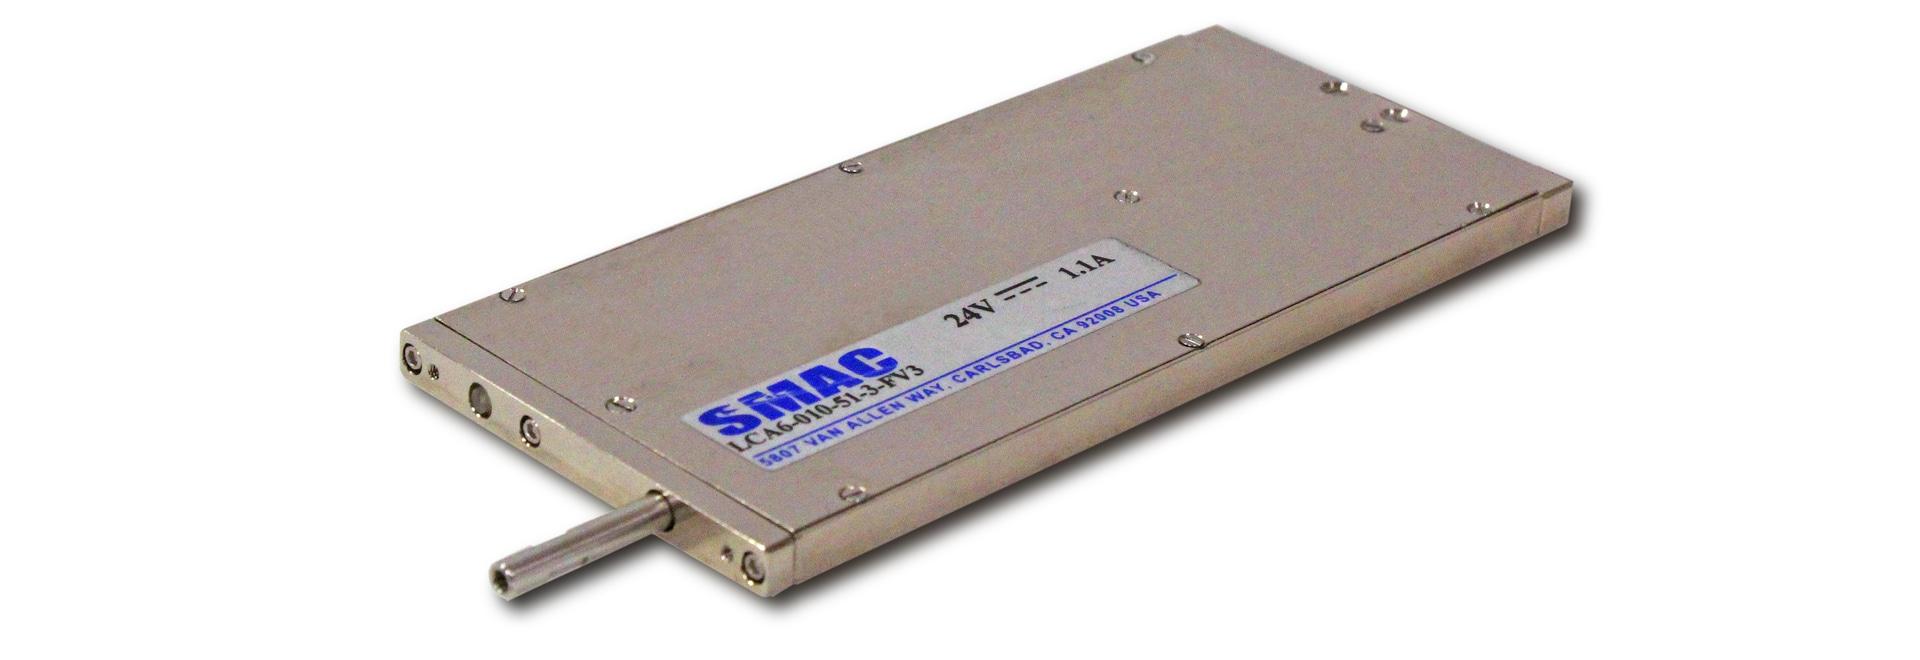 SMAC Moving Coil Actuators LCA6